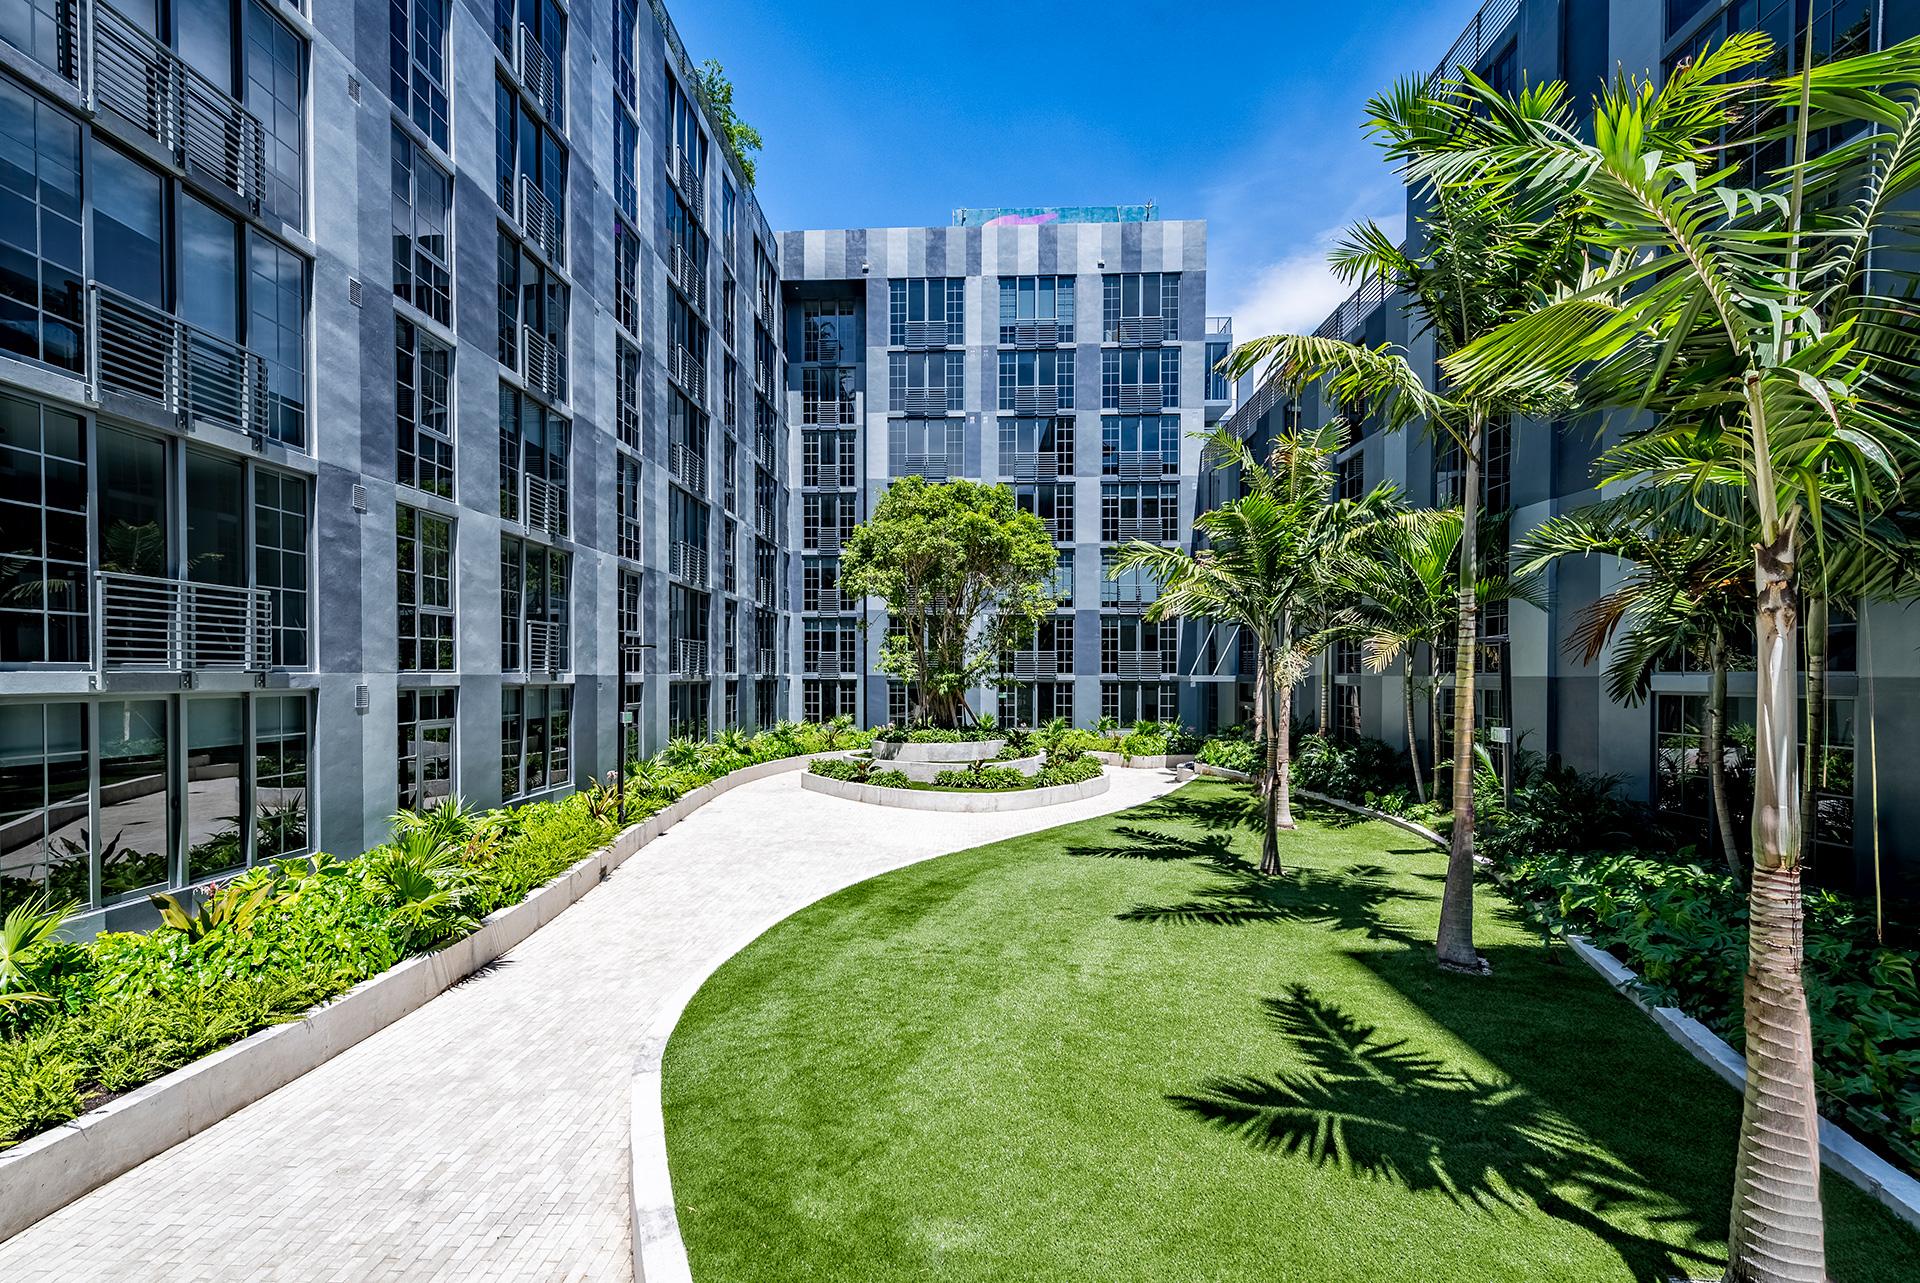 Courtyard and Zen Garden